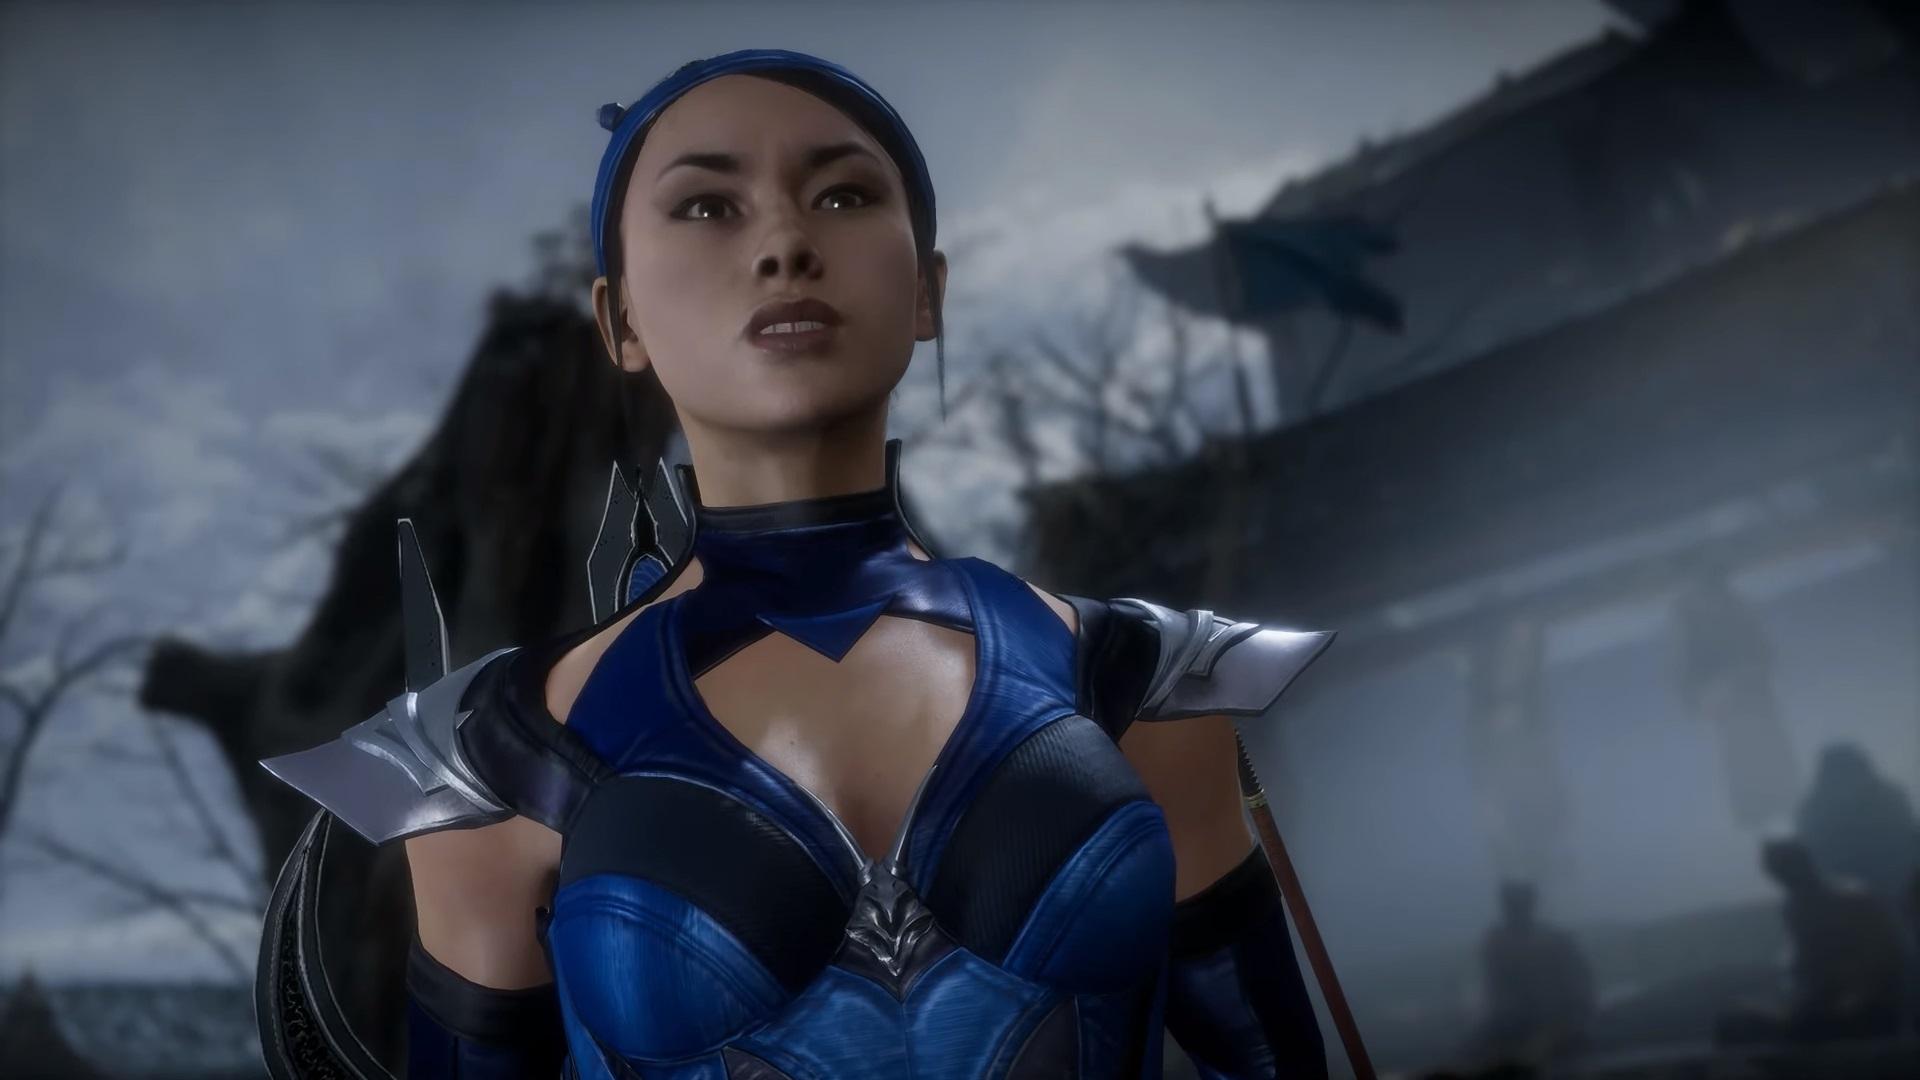 Mortal Kombat 11 Kitana Tips